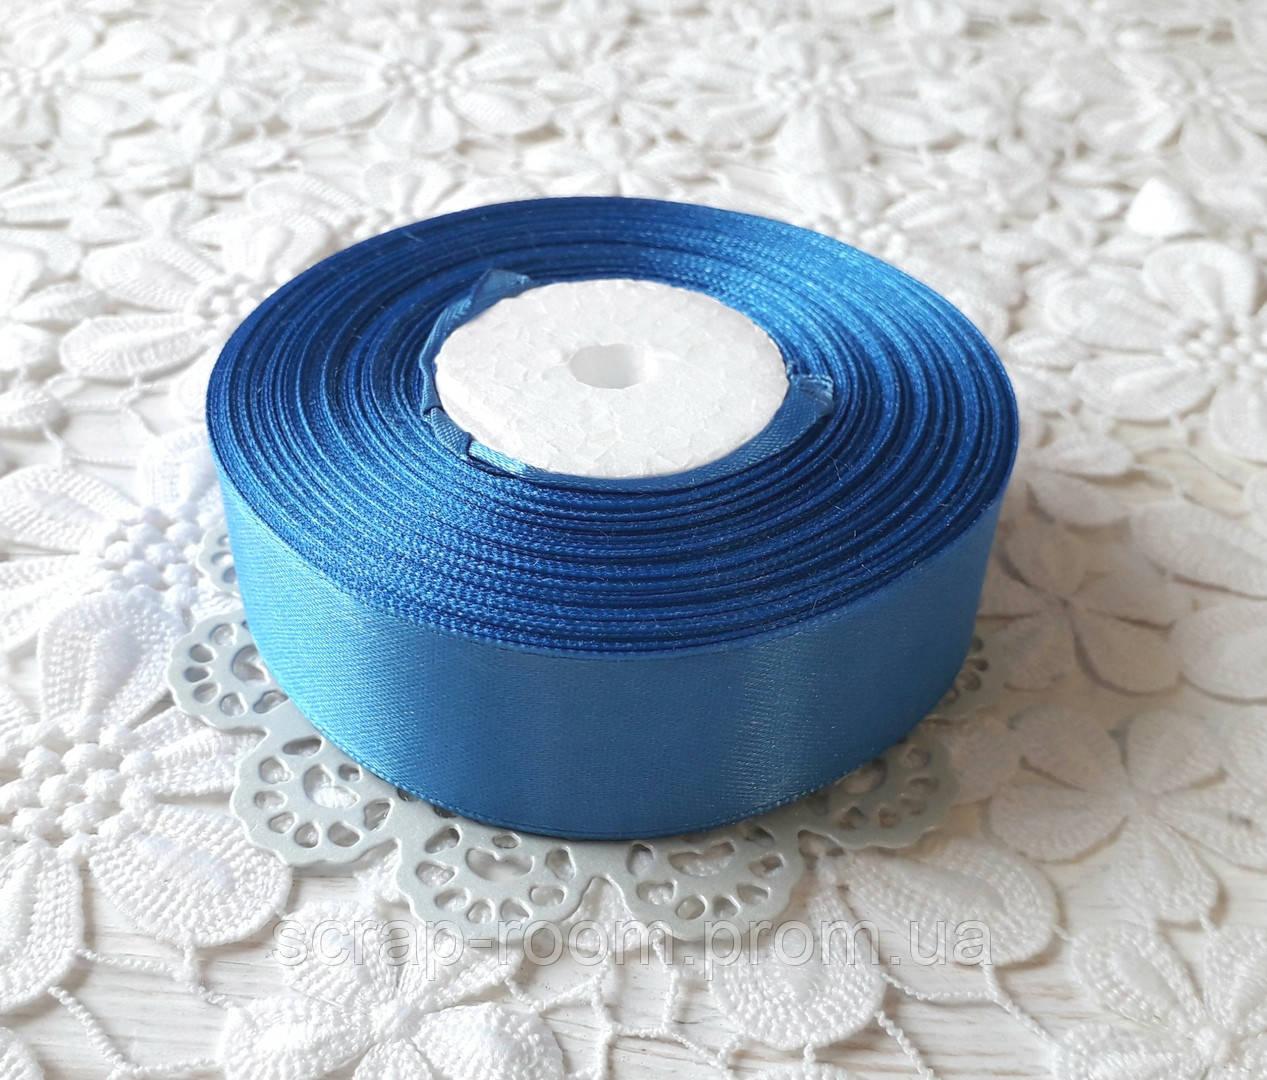 Лента атласная 2,5 см синяя, лента цвет синий атлас, лента атласная синяя, цена за метр